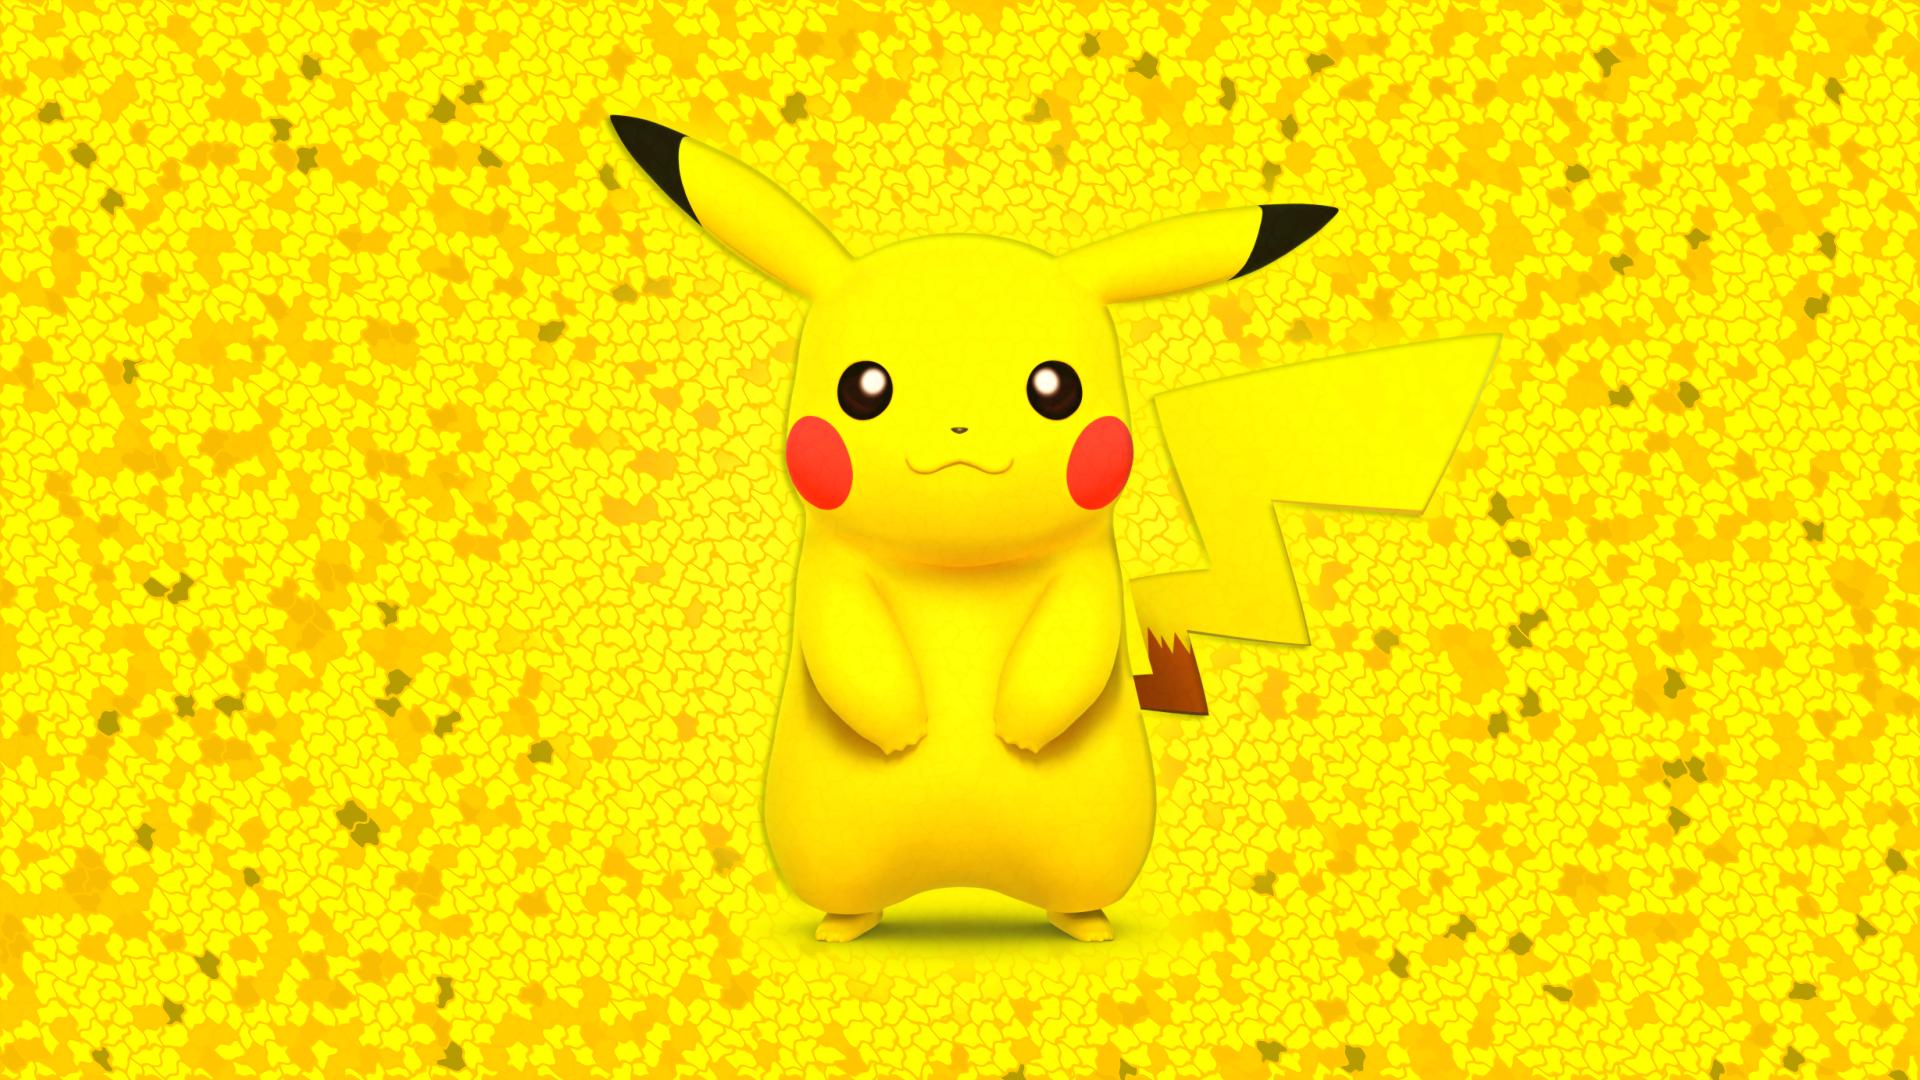 Pikachu Wallpaper  V2  by GlenchPikachu Face Wallpaper